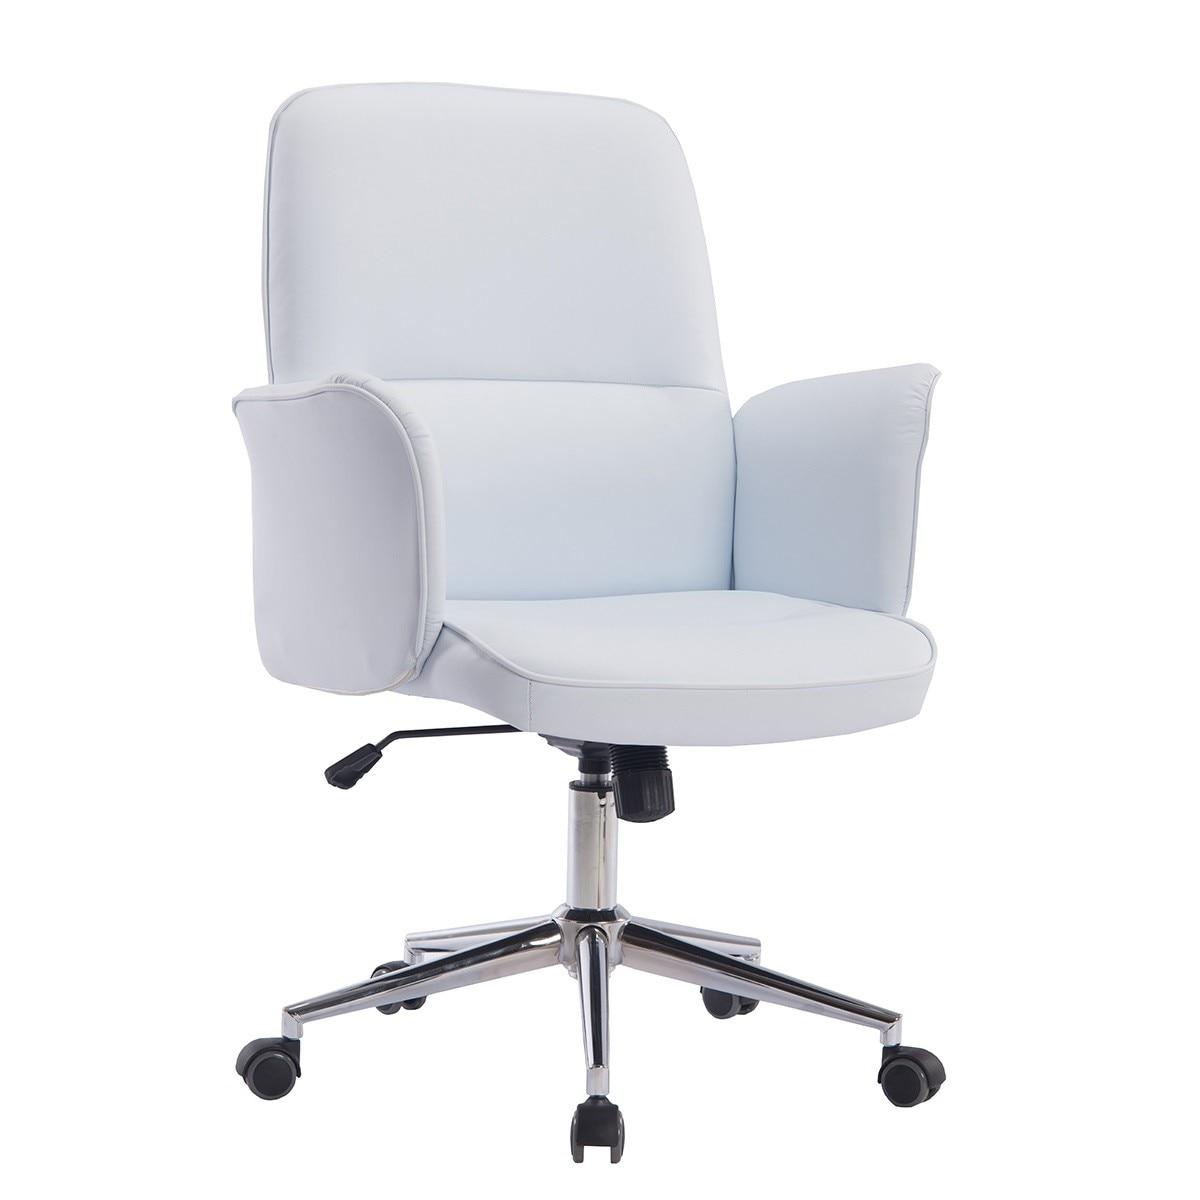 Office Armchair ANCONA, Gas, Tilt, Similpiel White